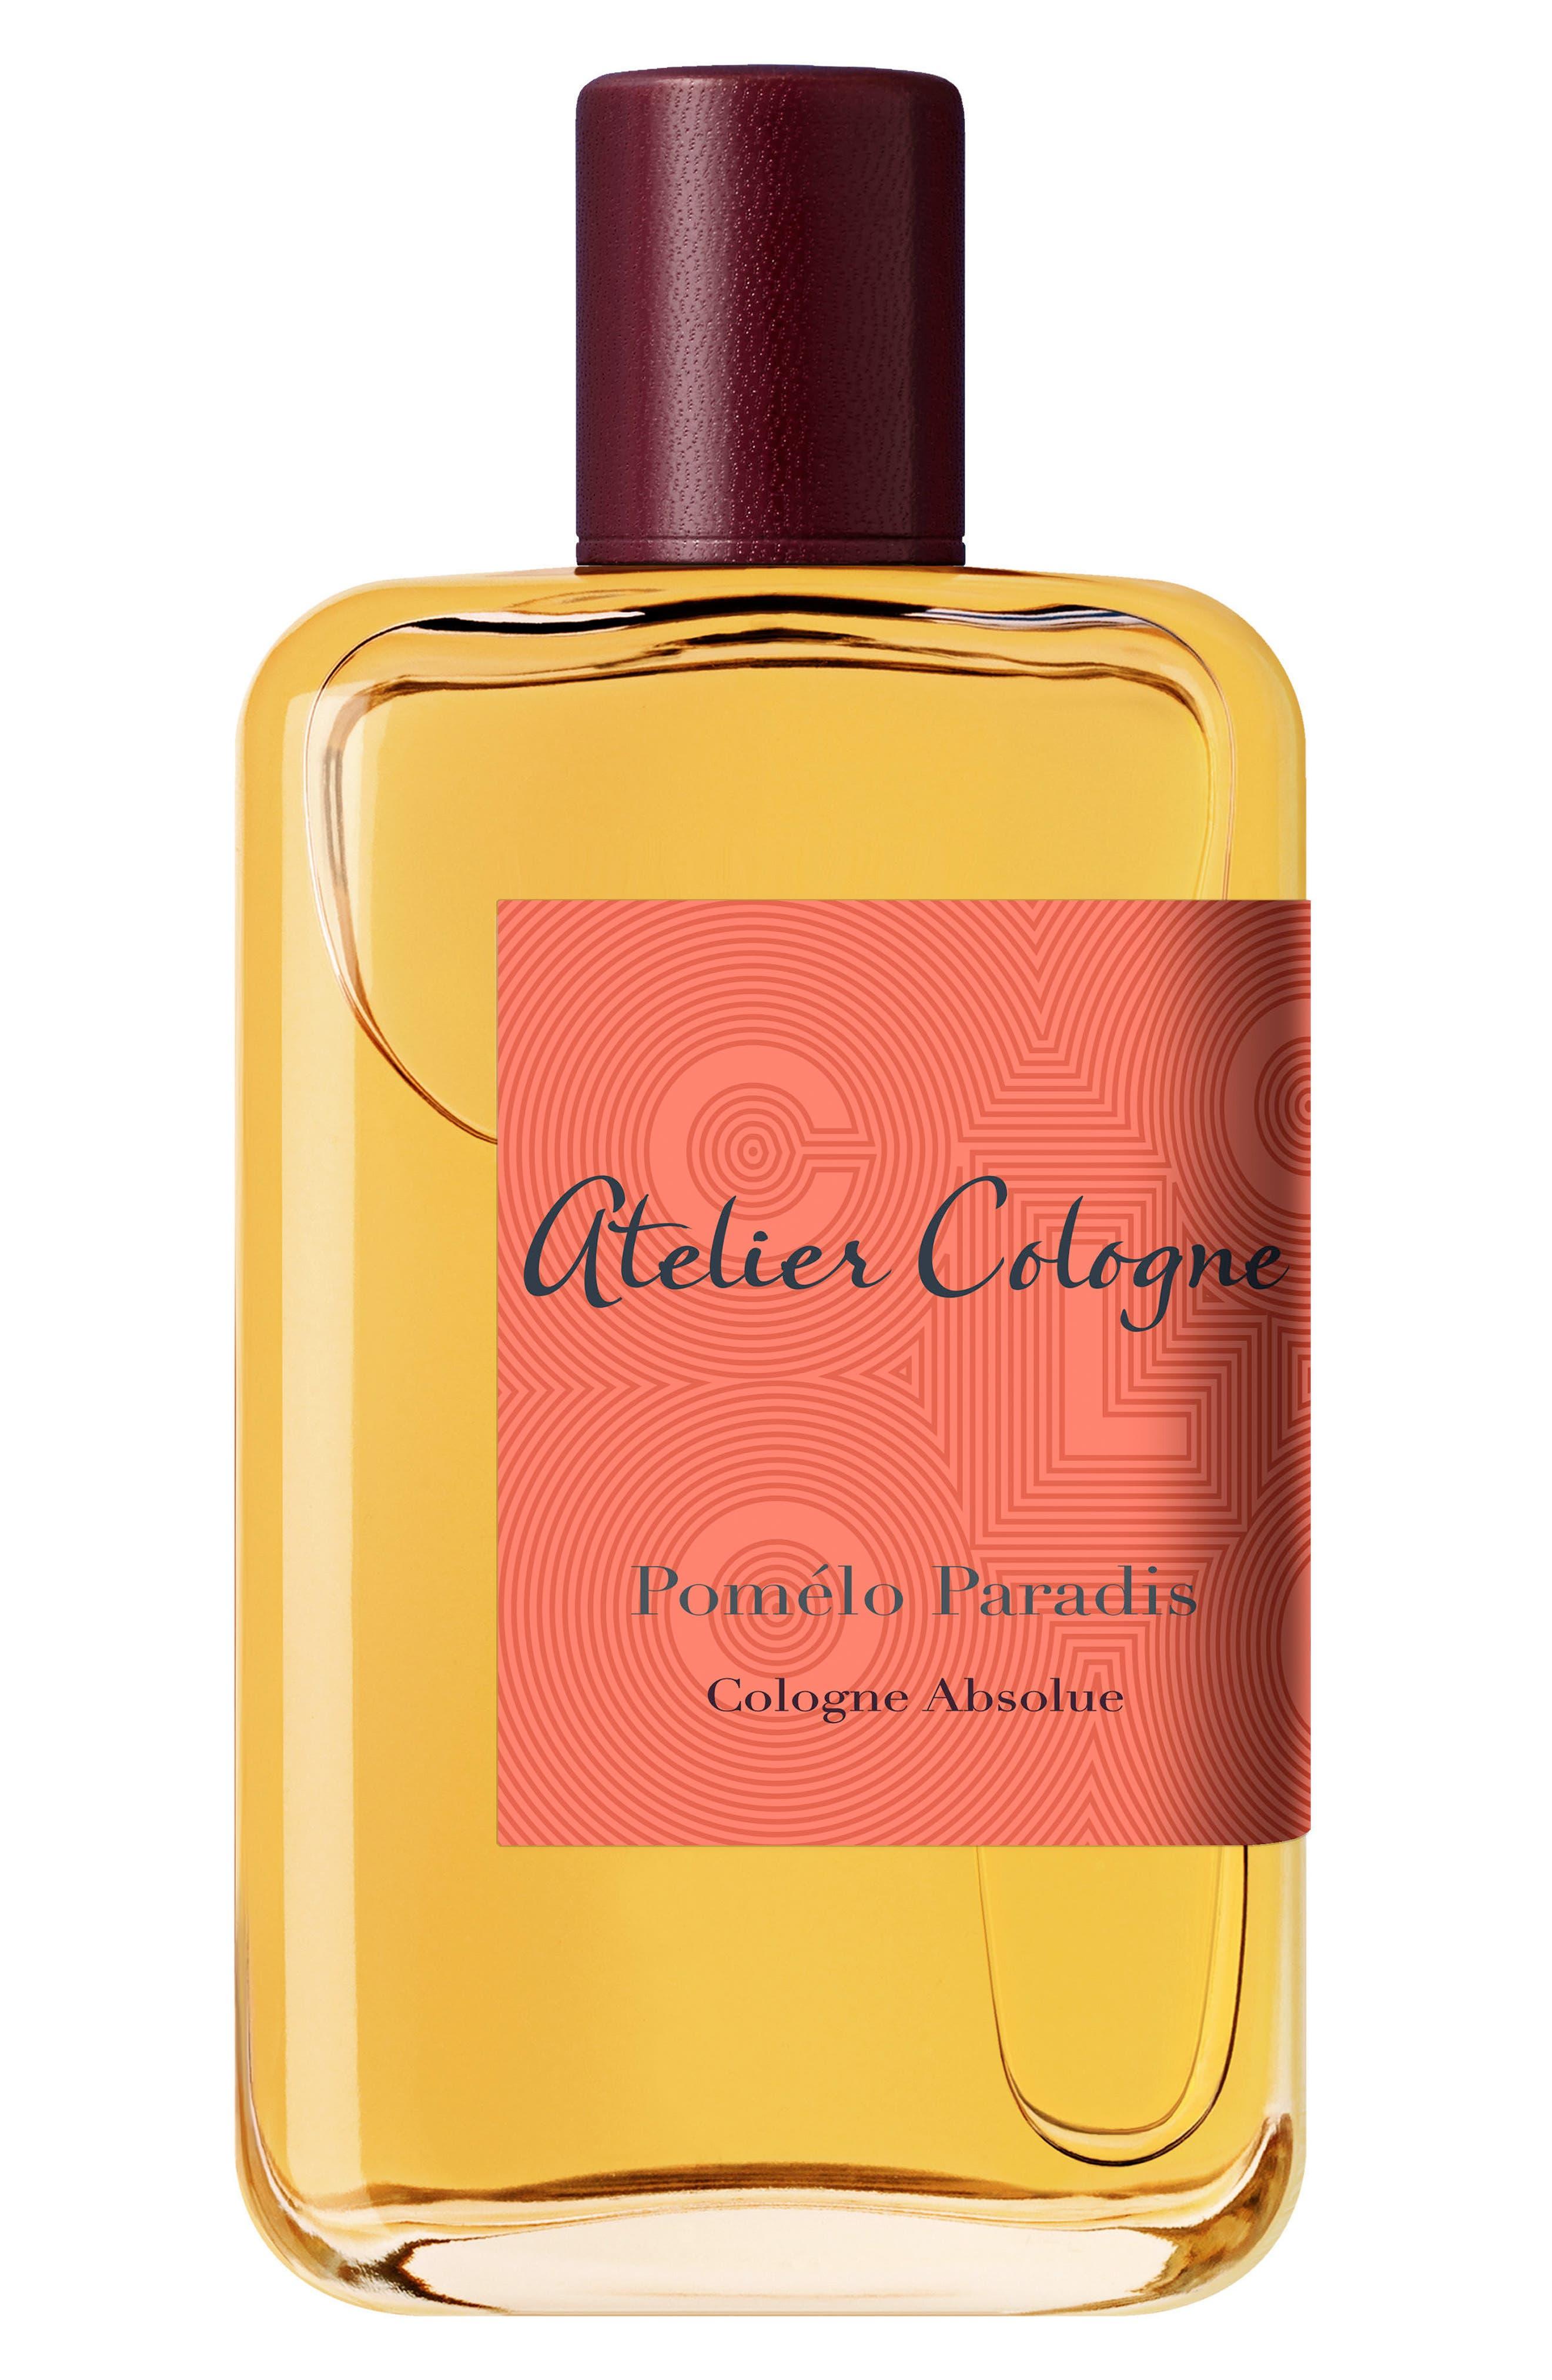 Atelier Cologne Pomelo Paradis Cologne Absolue